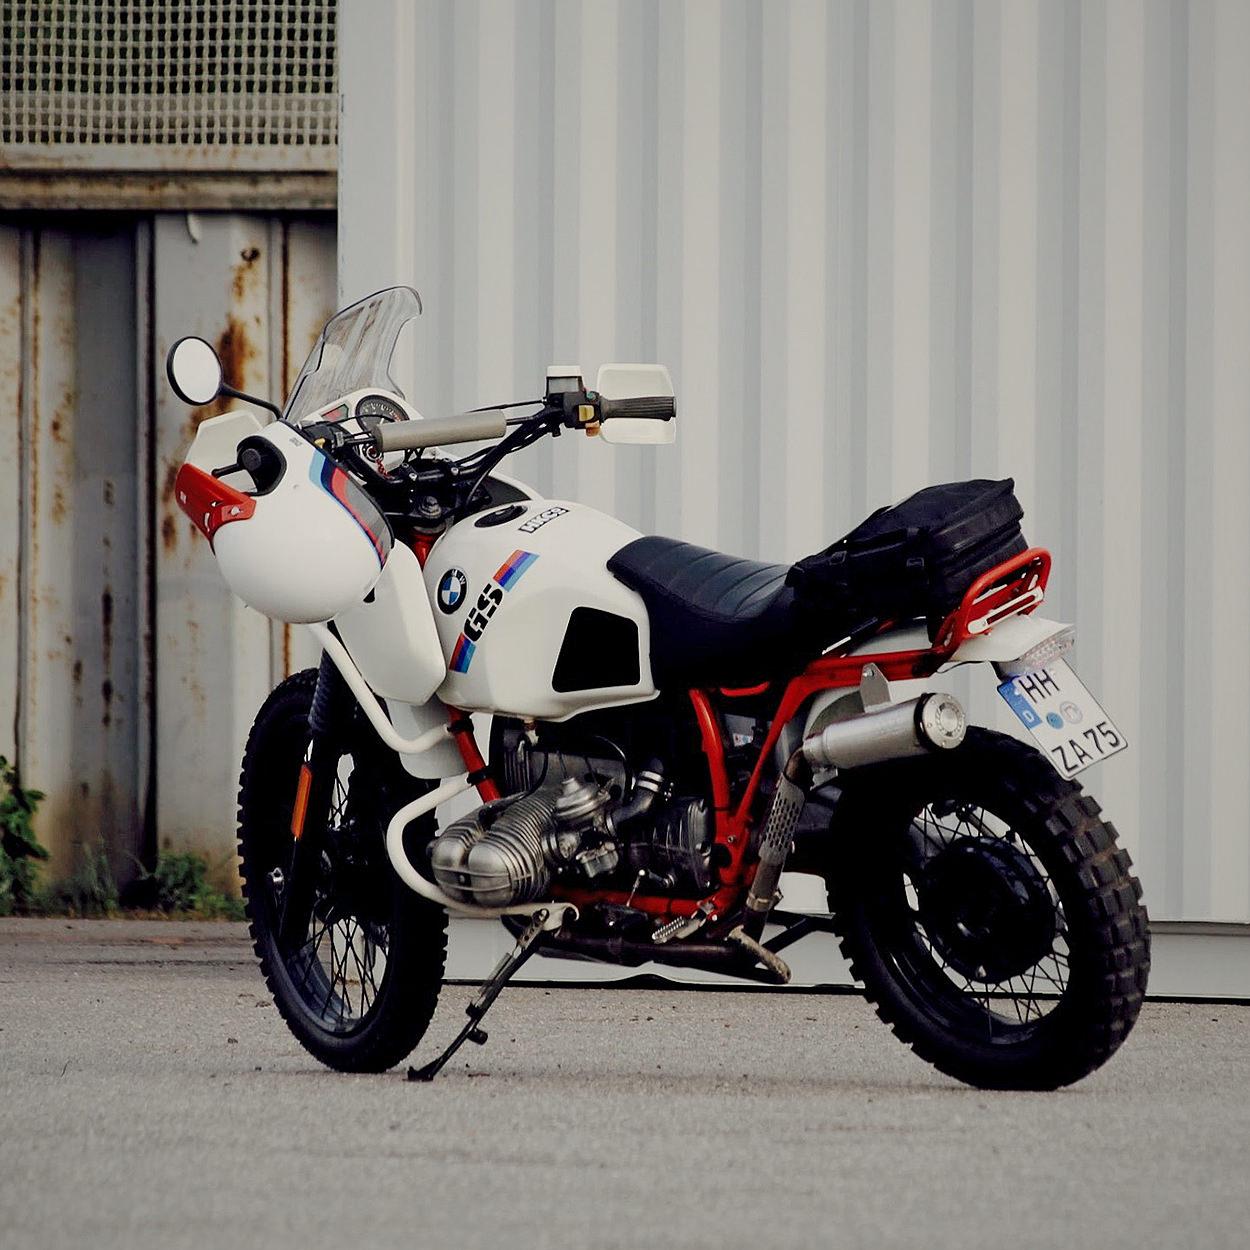 BMW R100GS by Karoo Bespoke Motorcycles